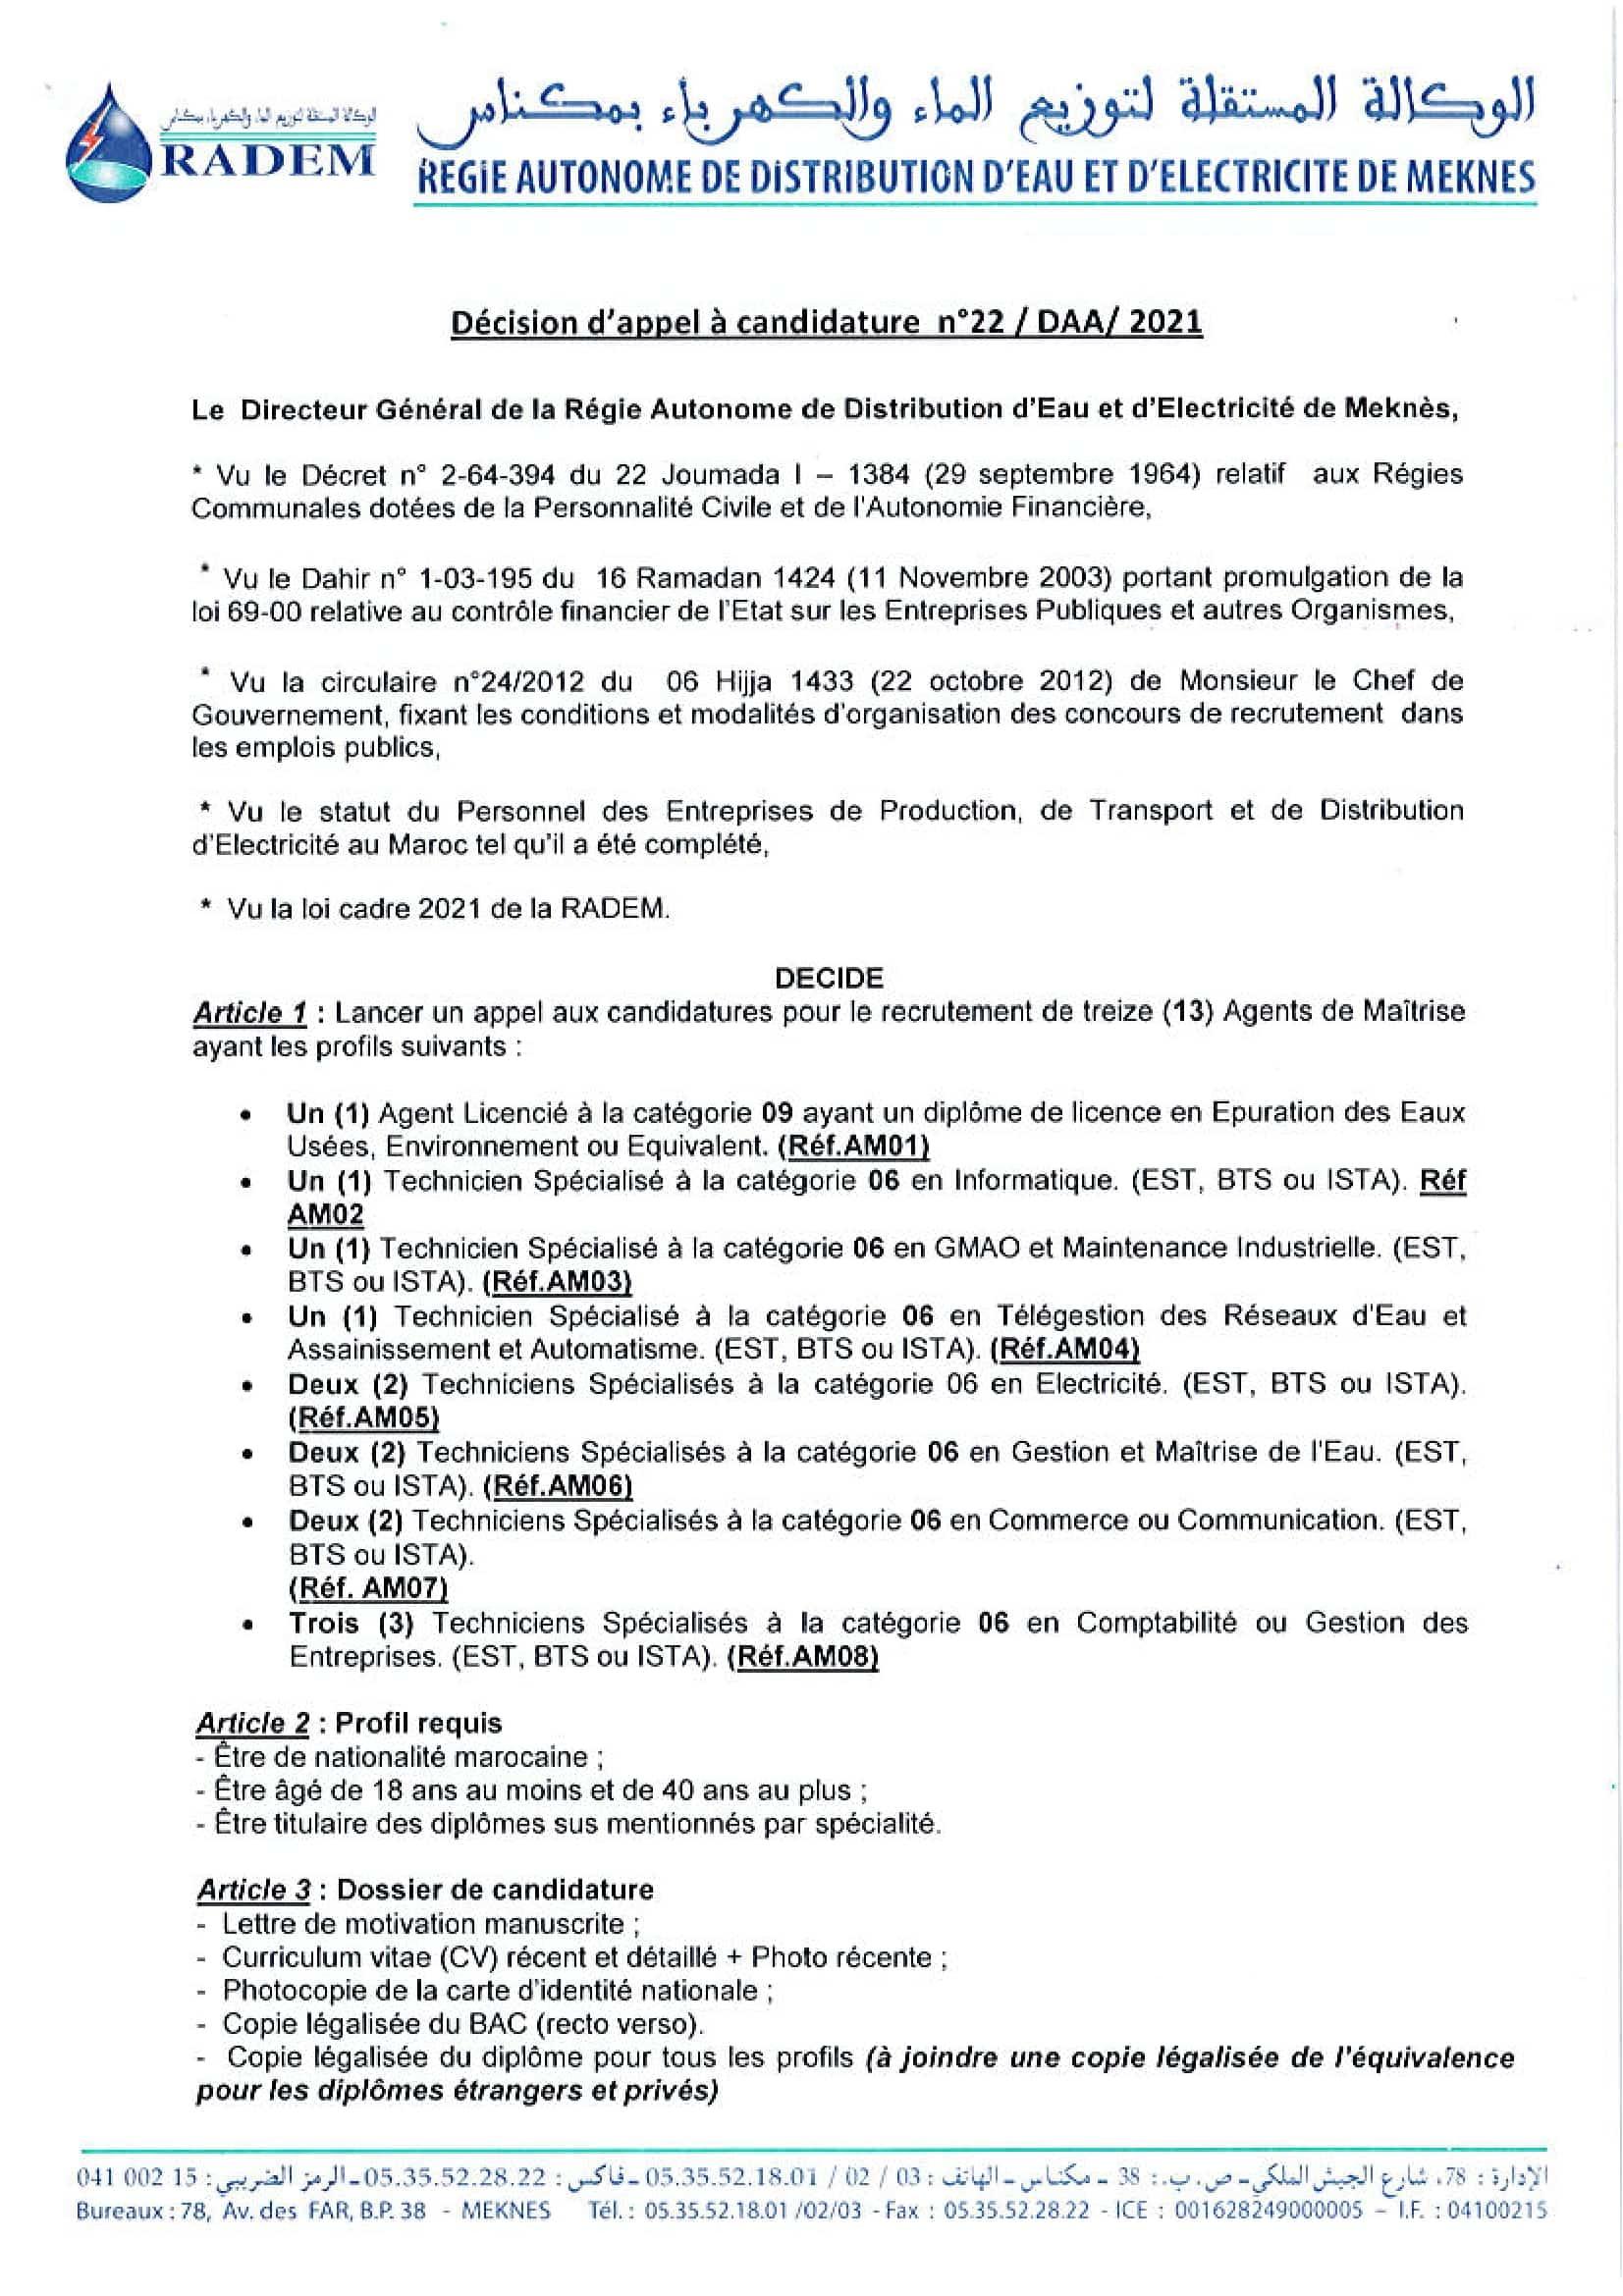 AGENTSDEMAITRISE 1 Concours de Recrutement RADEM 2021 (30 Postes)